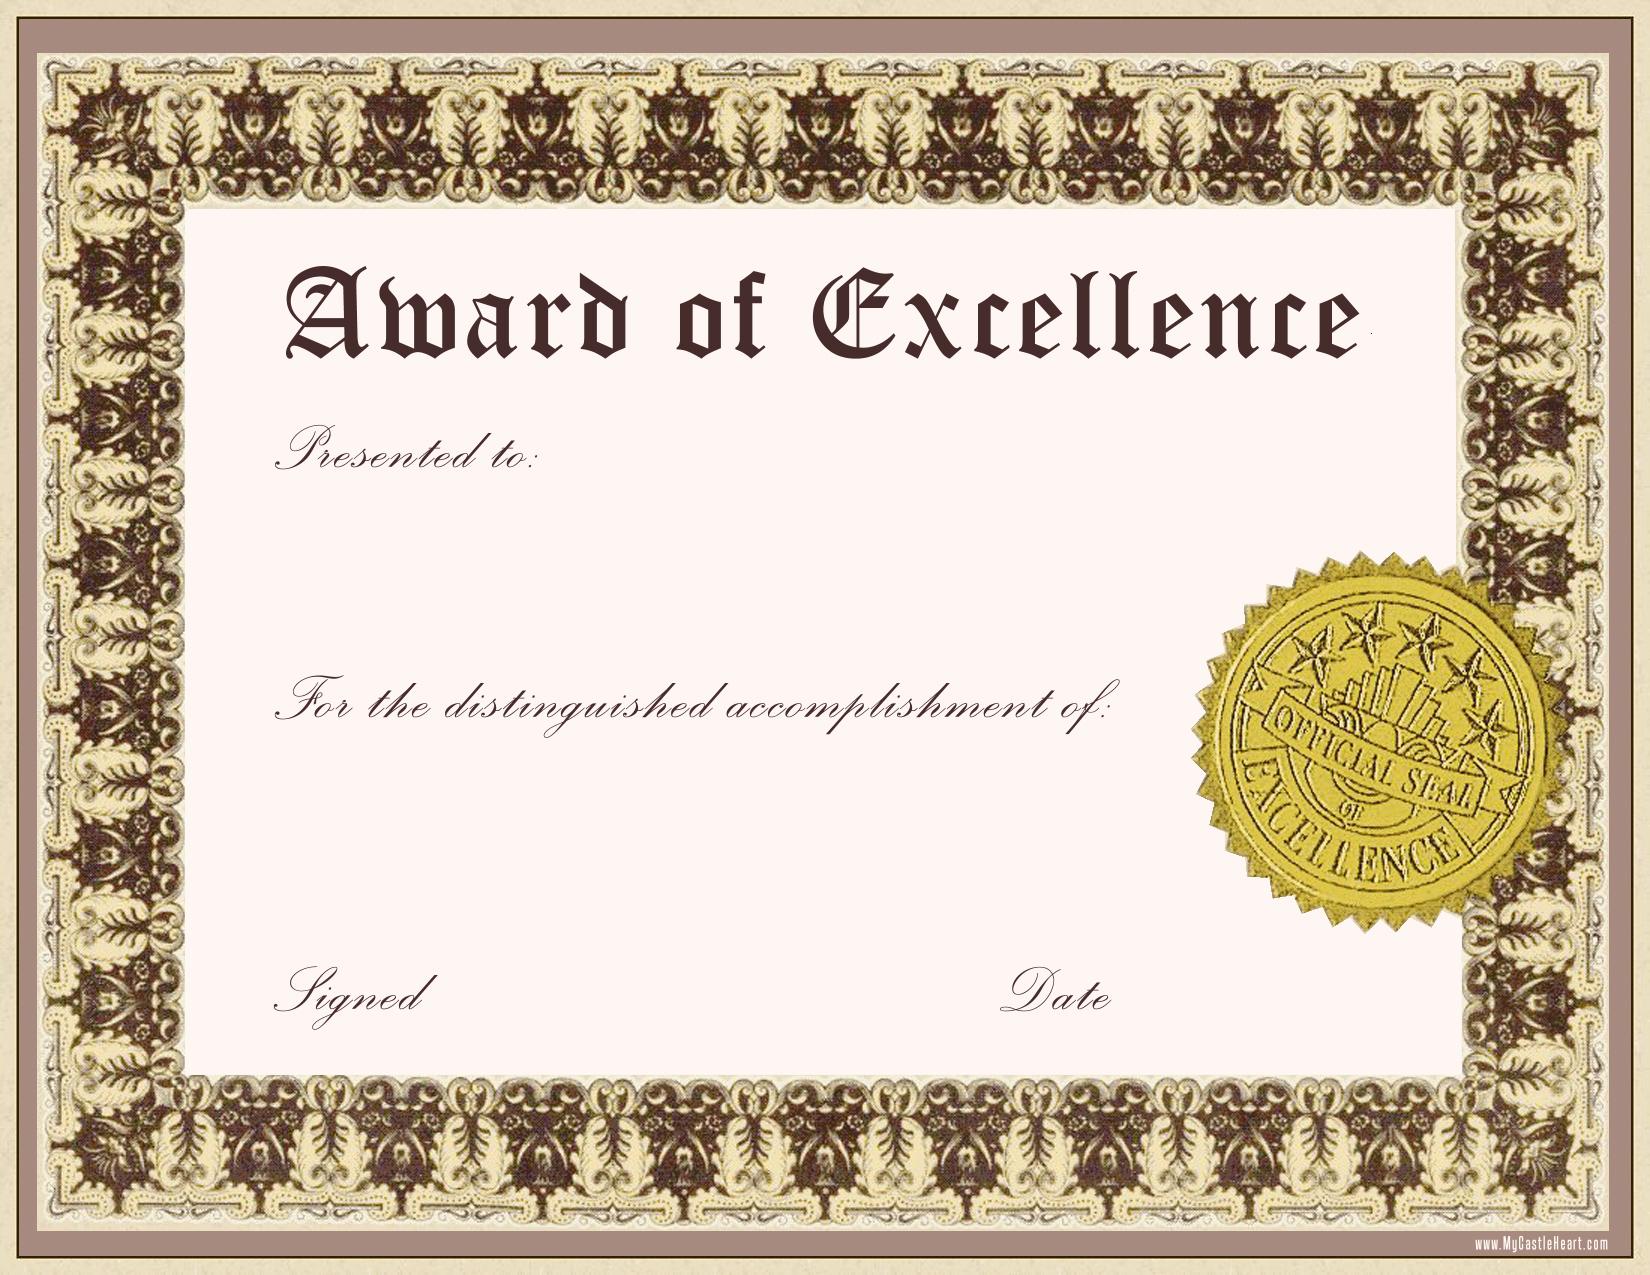 Pin Award Certificate Template on Pinterest el3KMiFe